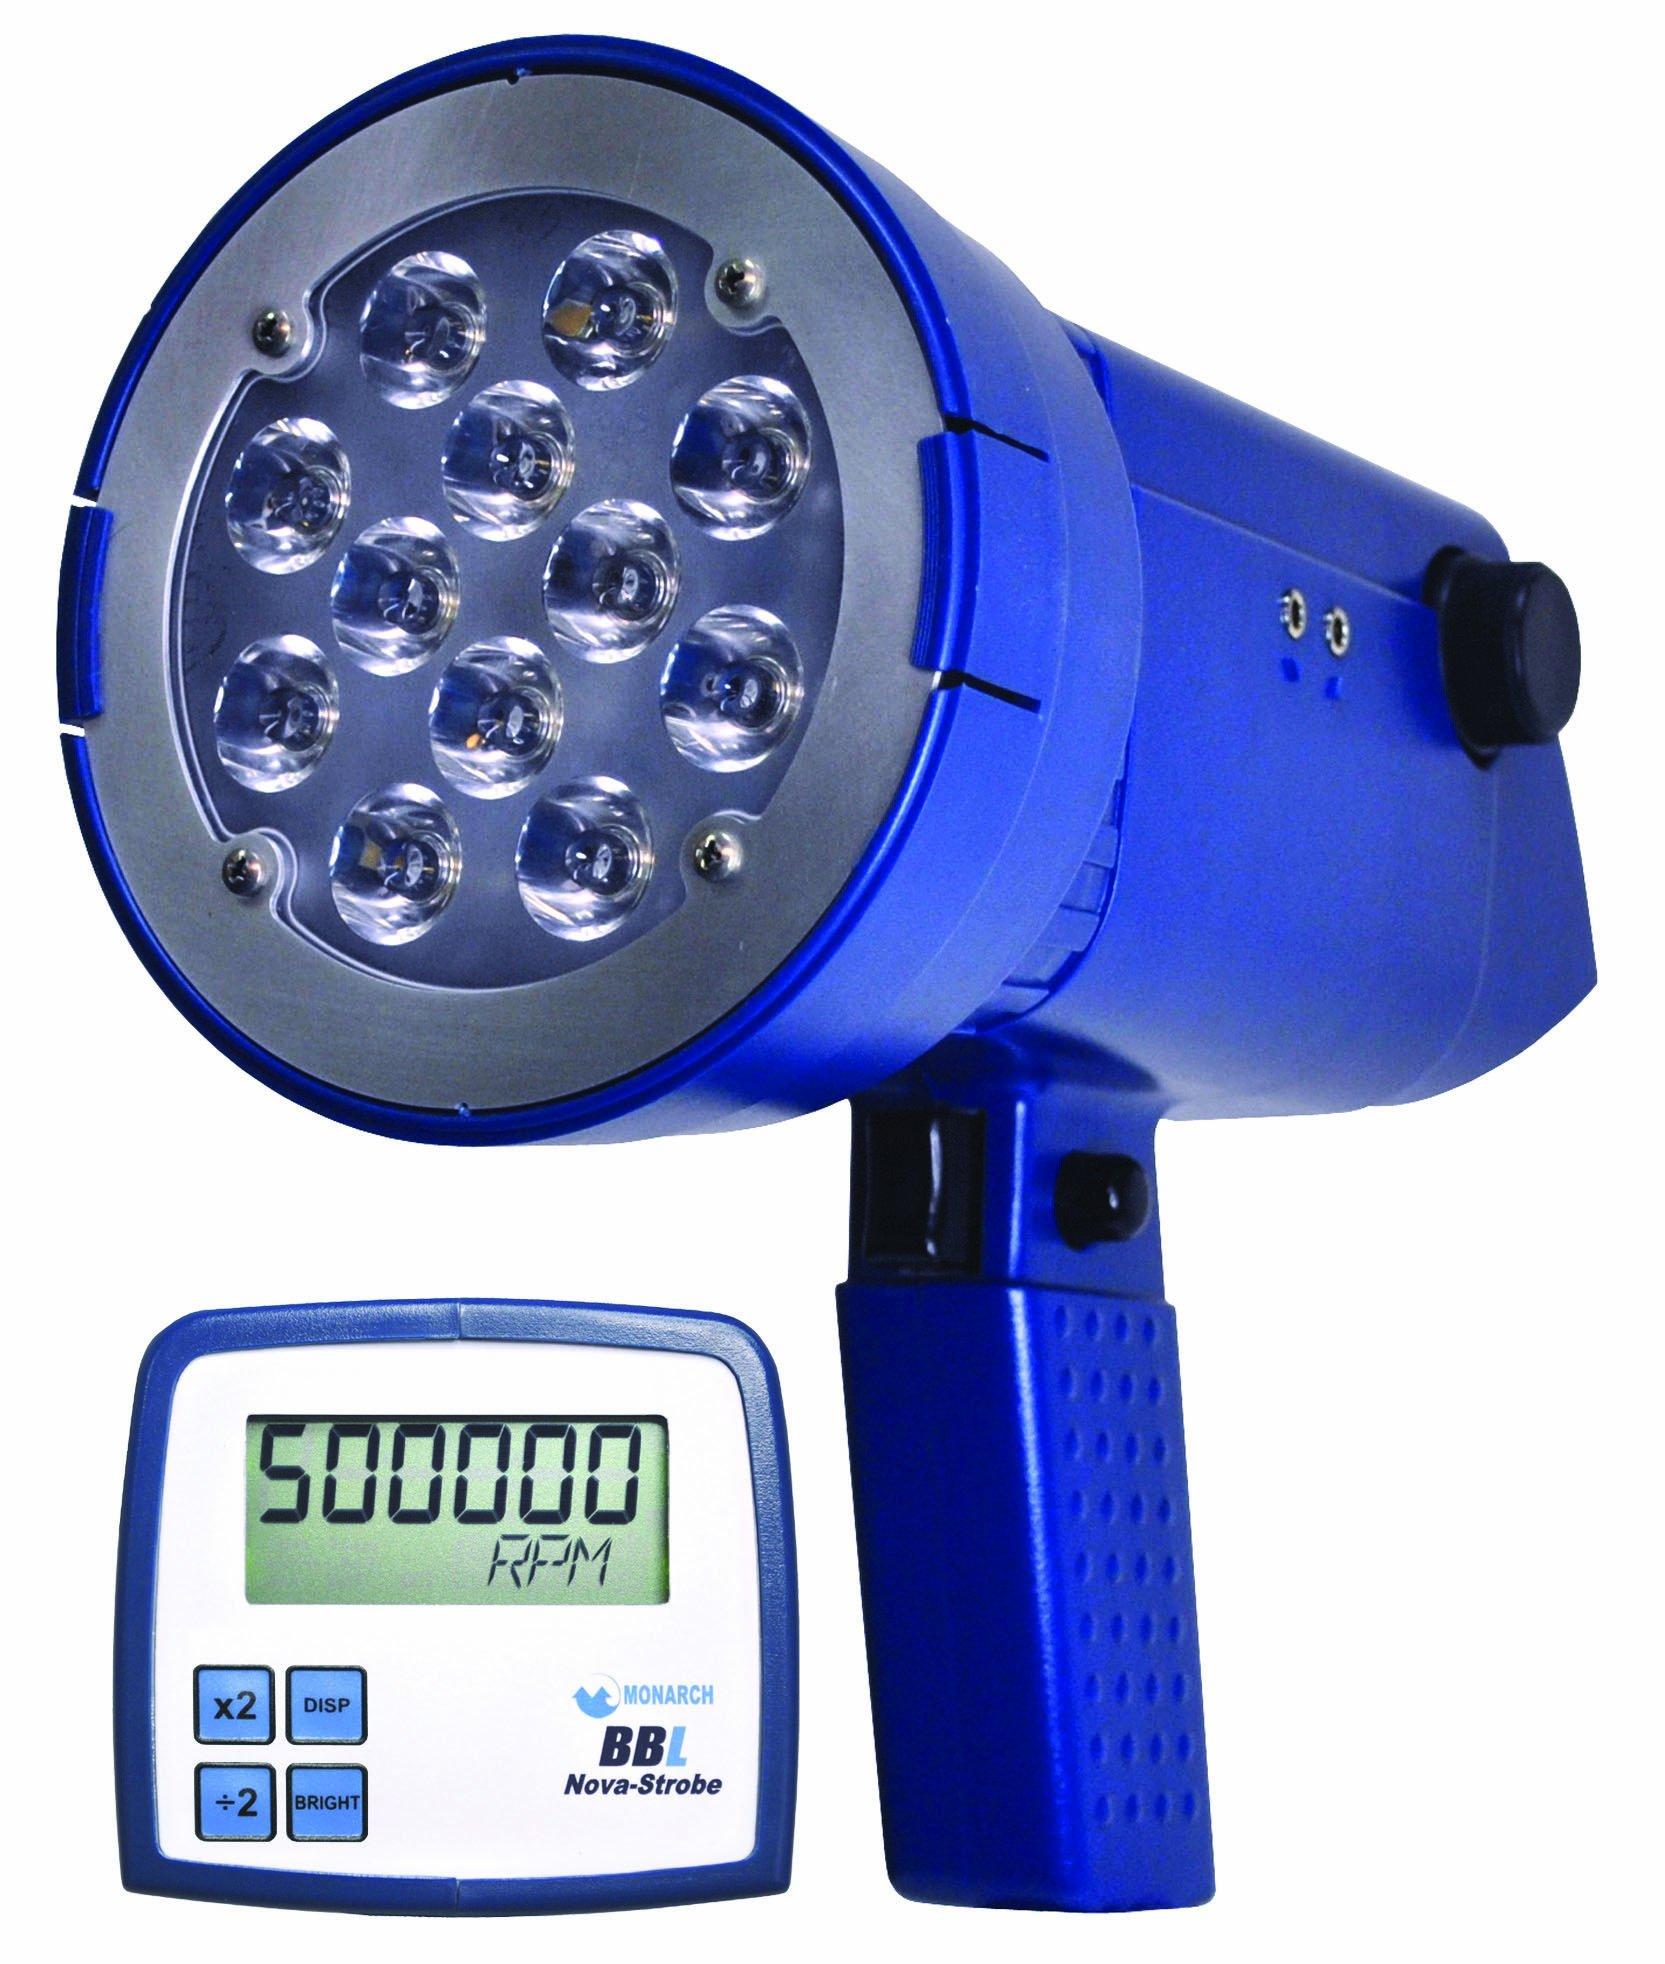 Monarch Nova-Strobe BBL LED Portable Stroboscope, Rechargeable Battery, 9'' L x 3.66'' W x 3.56'' H by Monarch Instrument